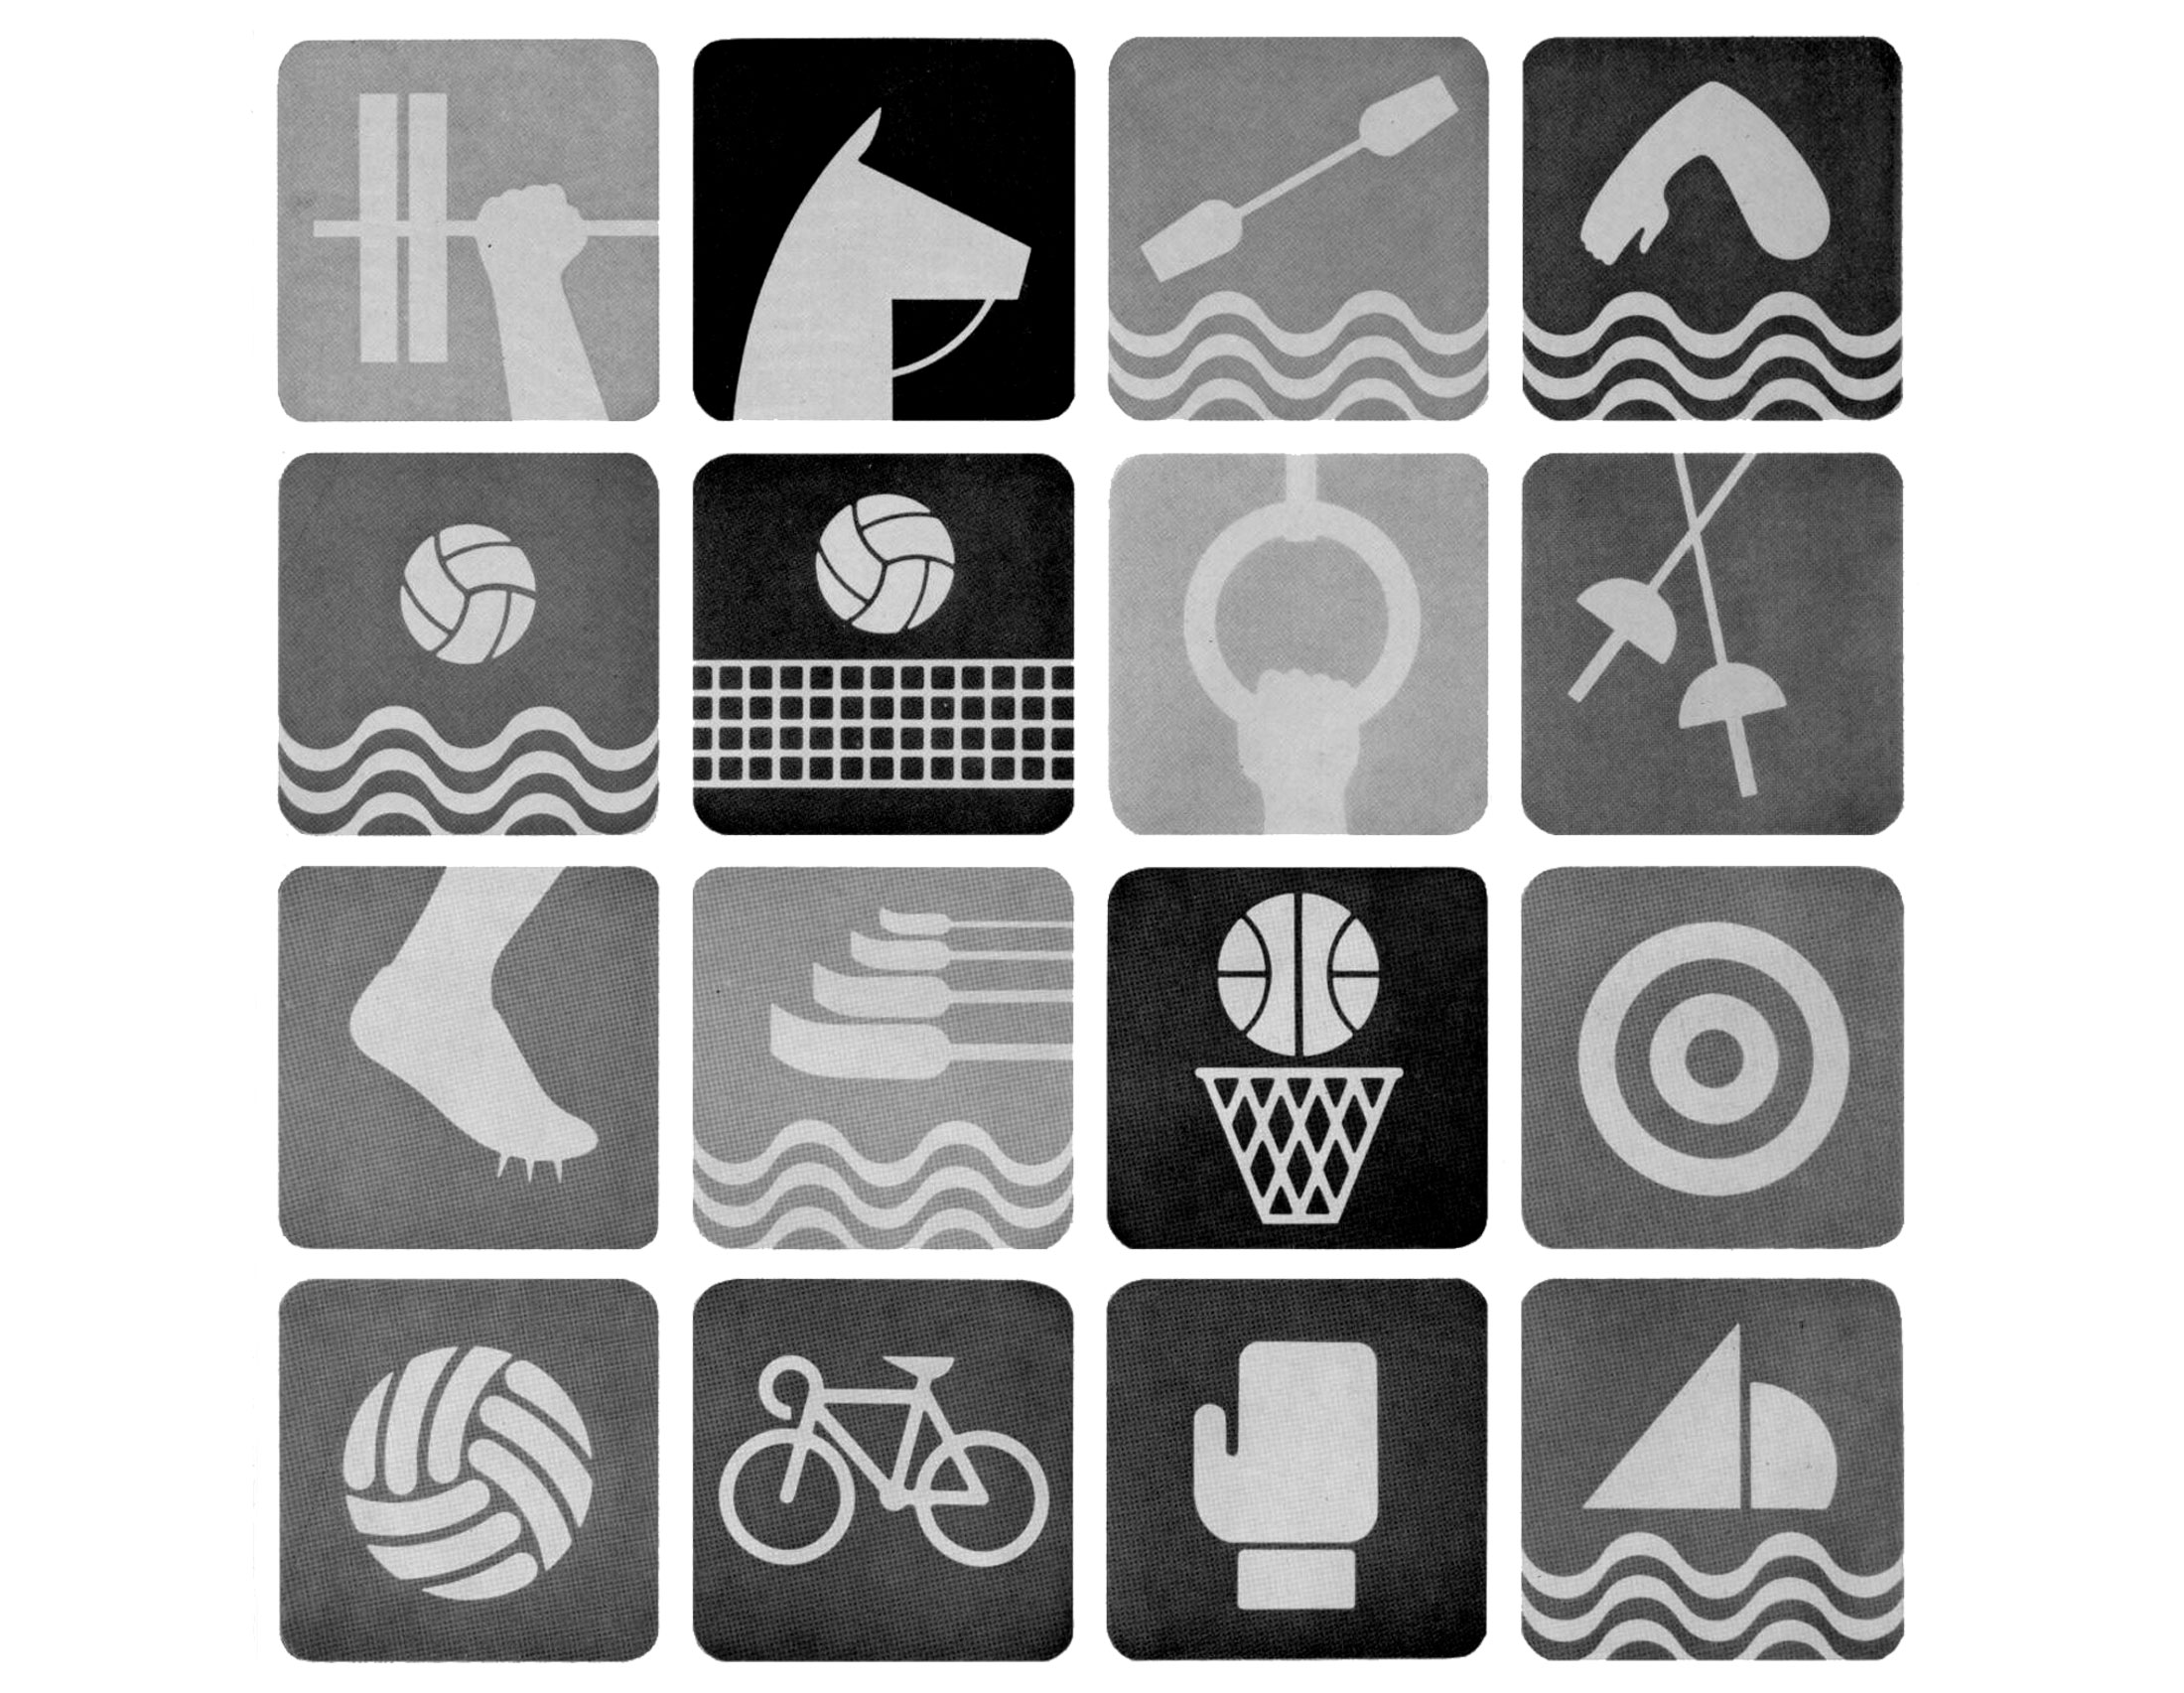 Pictogramme-Jeux-Olympiques-Mexico-1968-LANCE-WYMAN